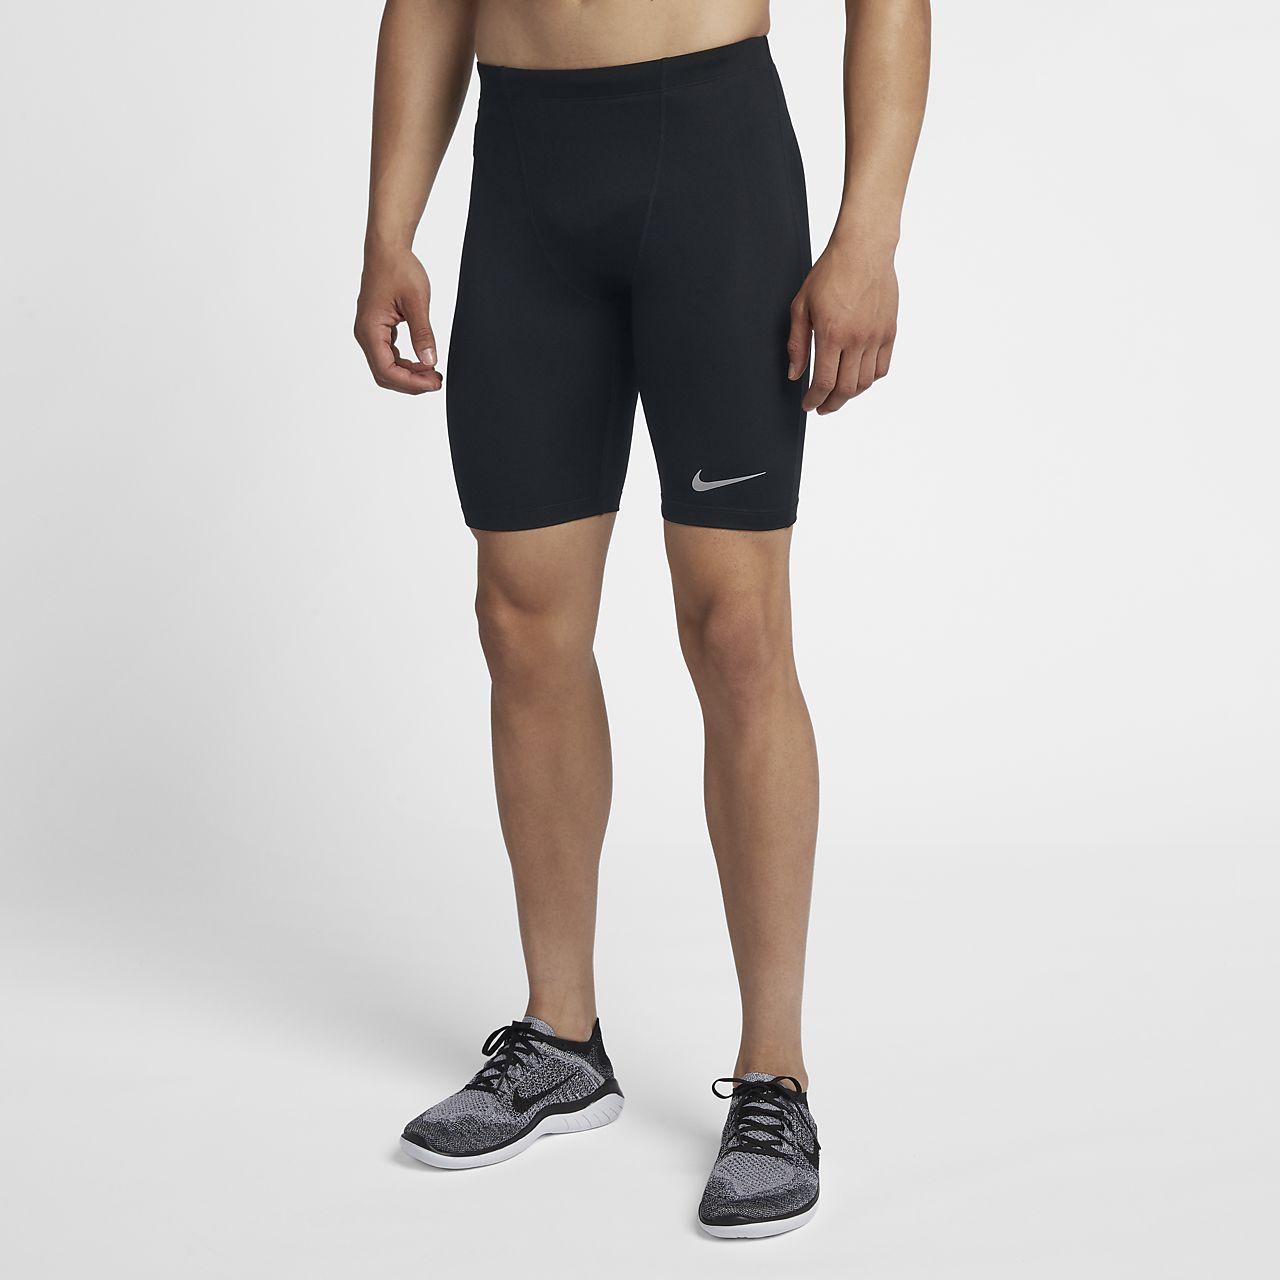 Męskie legginsy do biegania 1/2 Nike